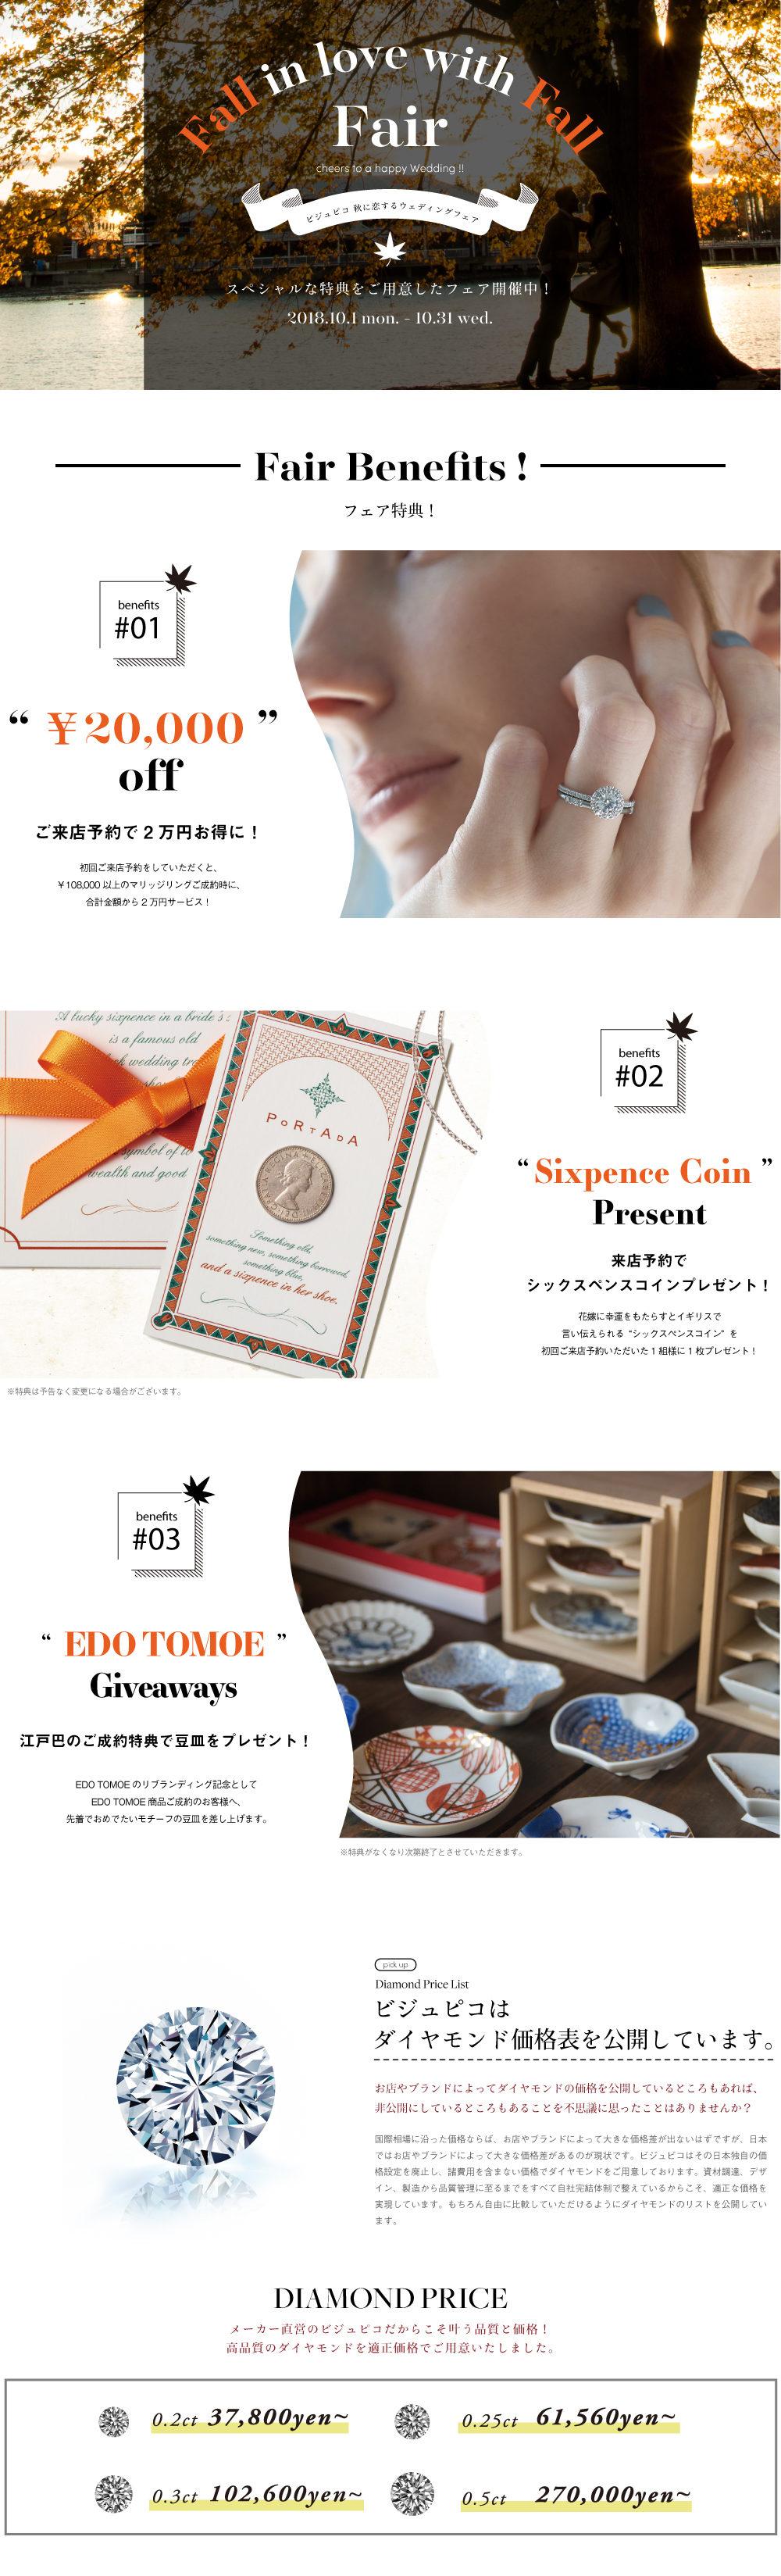 181001_opiko_shopshosai_fiar-pc